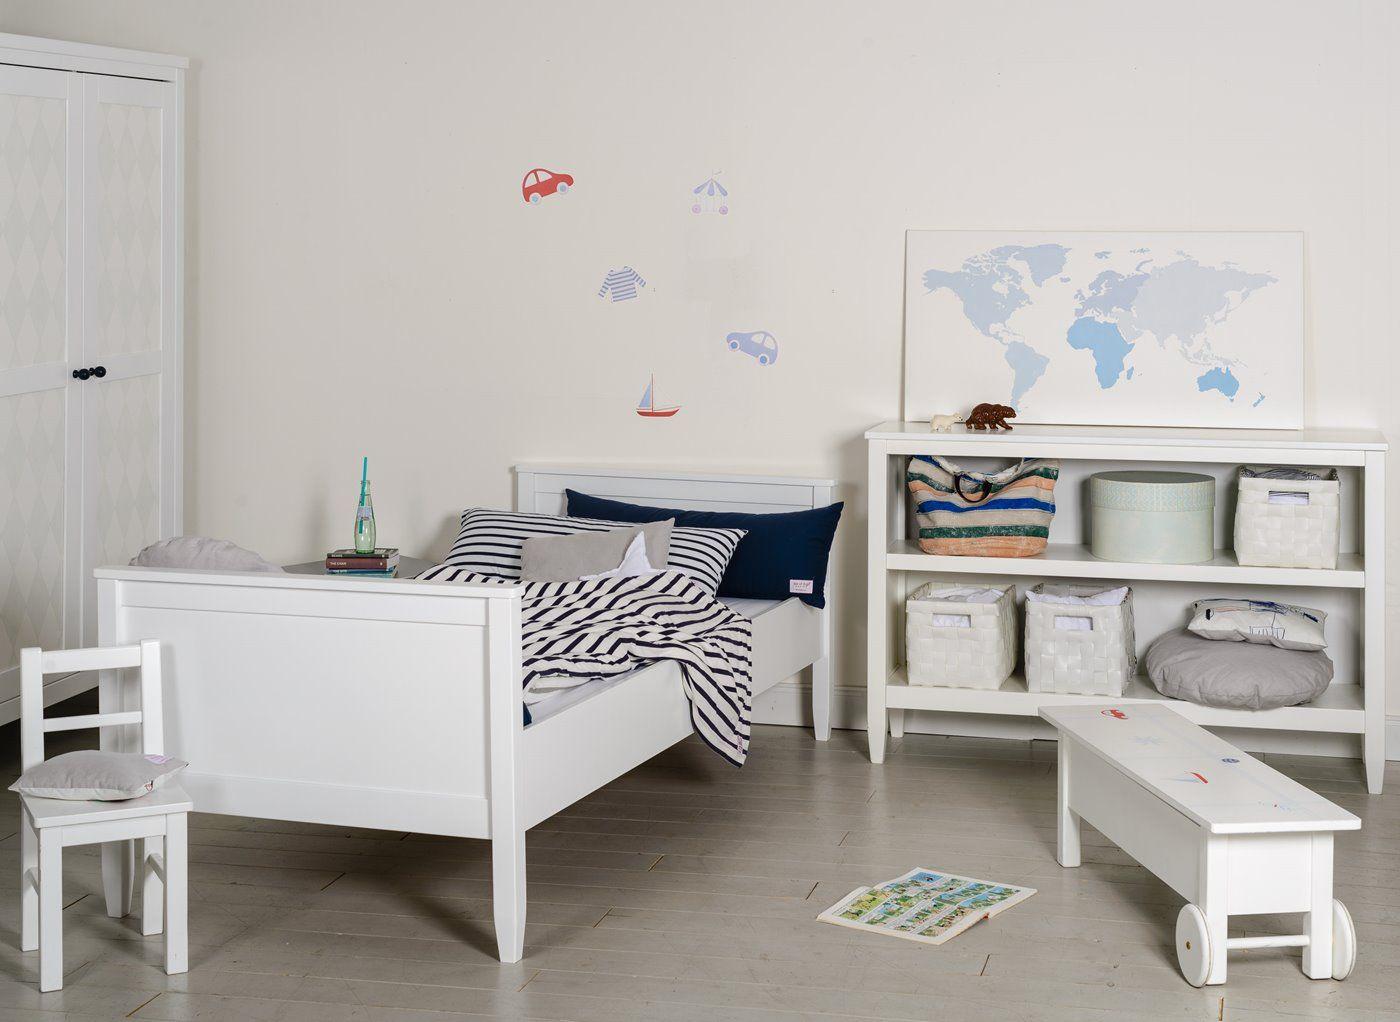 Juniorzimmer blau   Inspiration   isle of dogs DESIGN Wuppertal